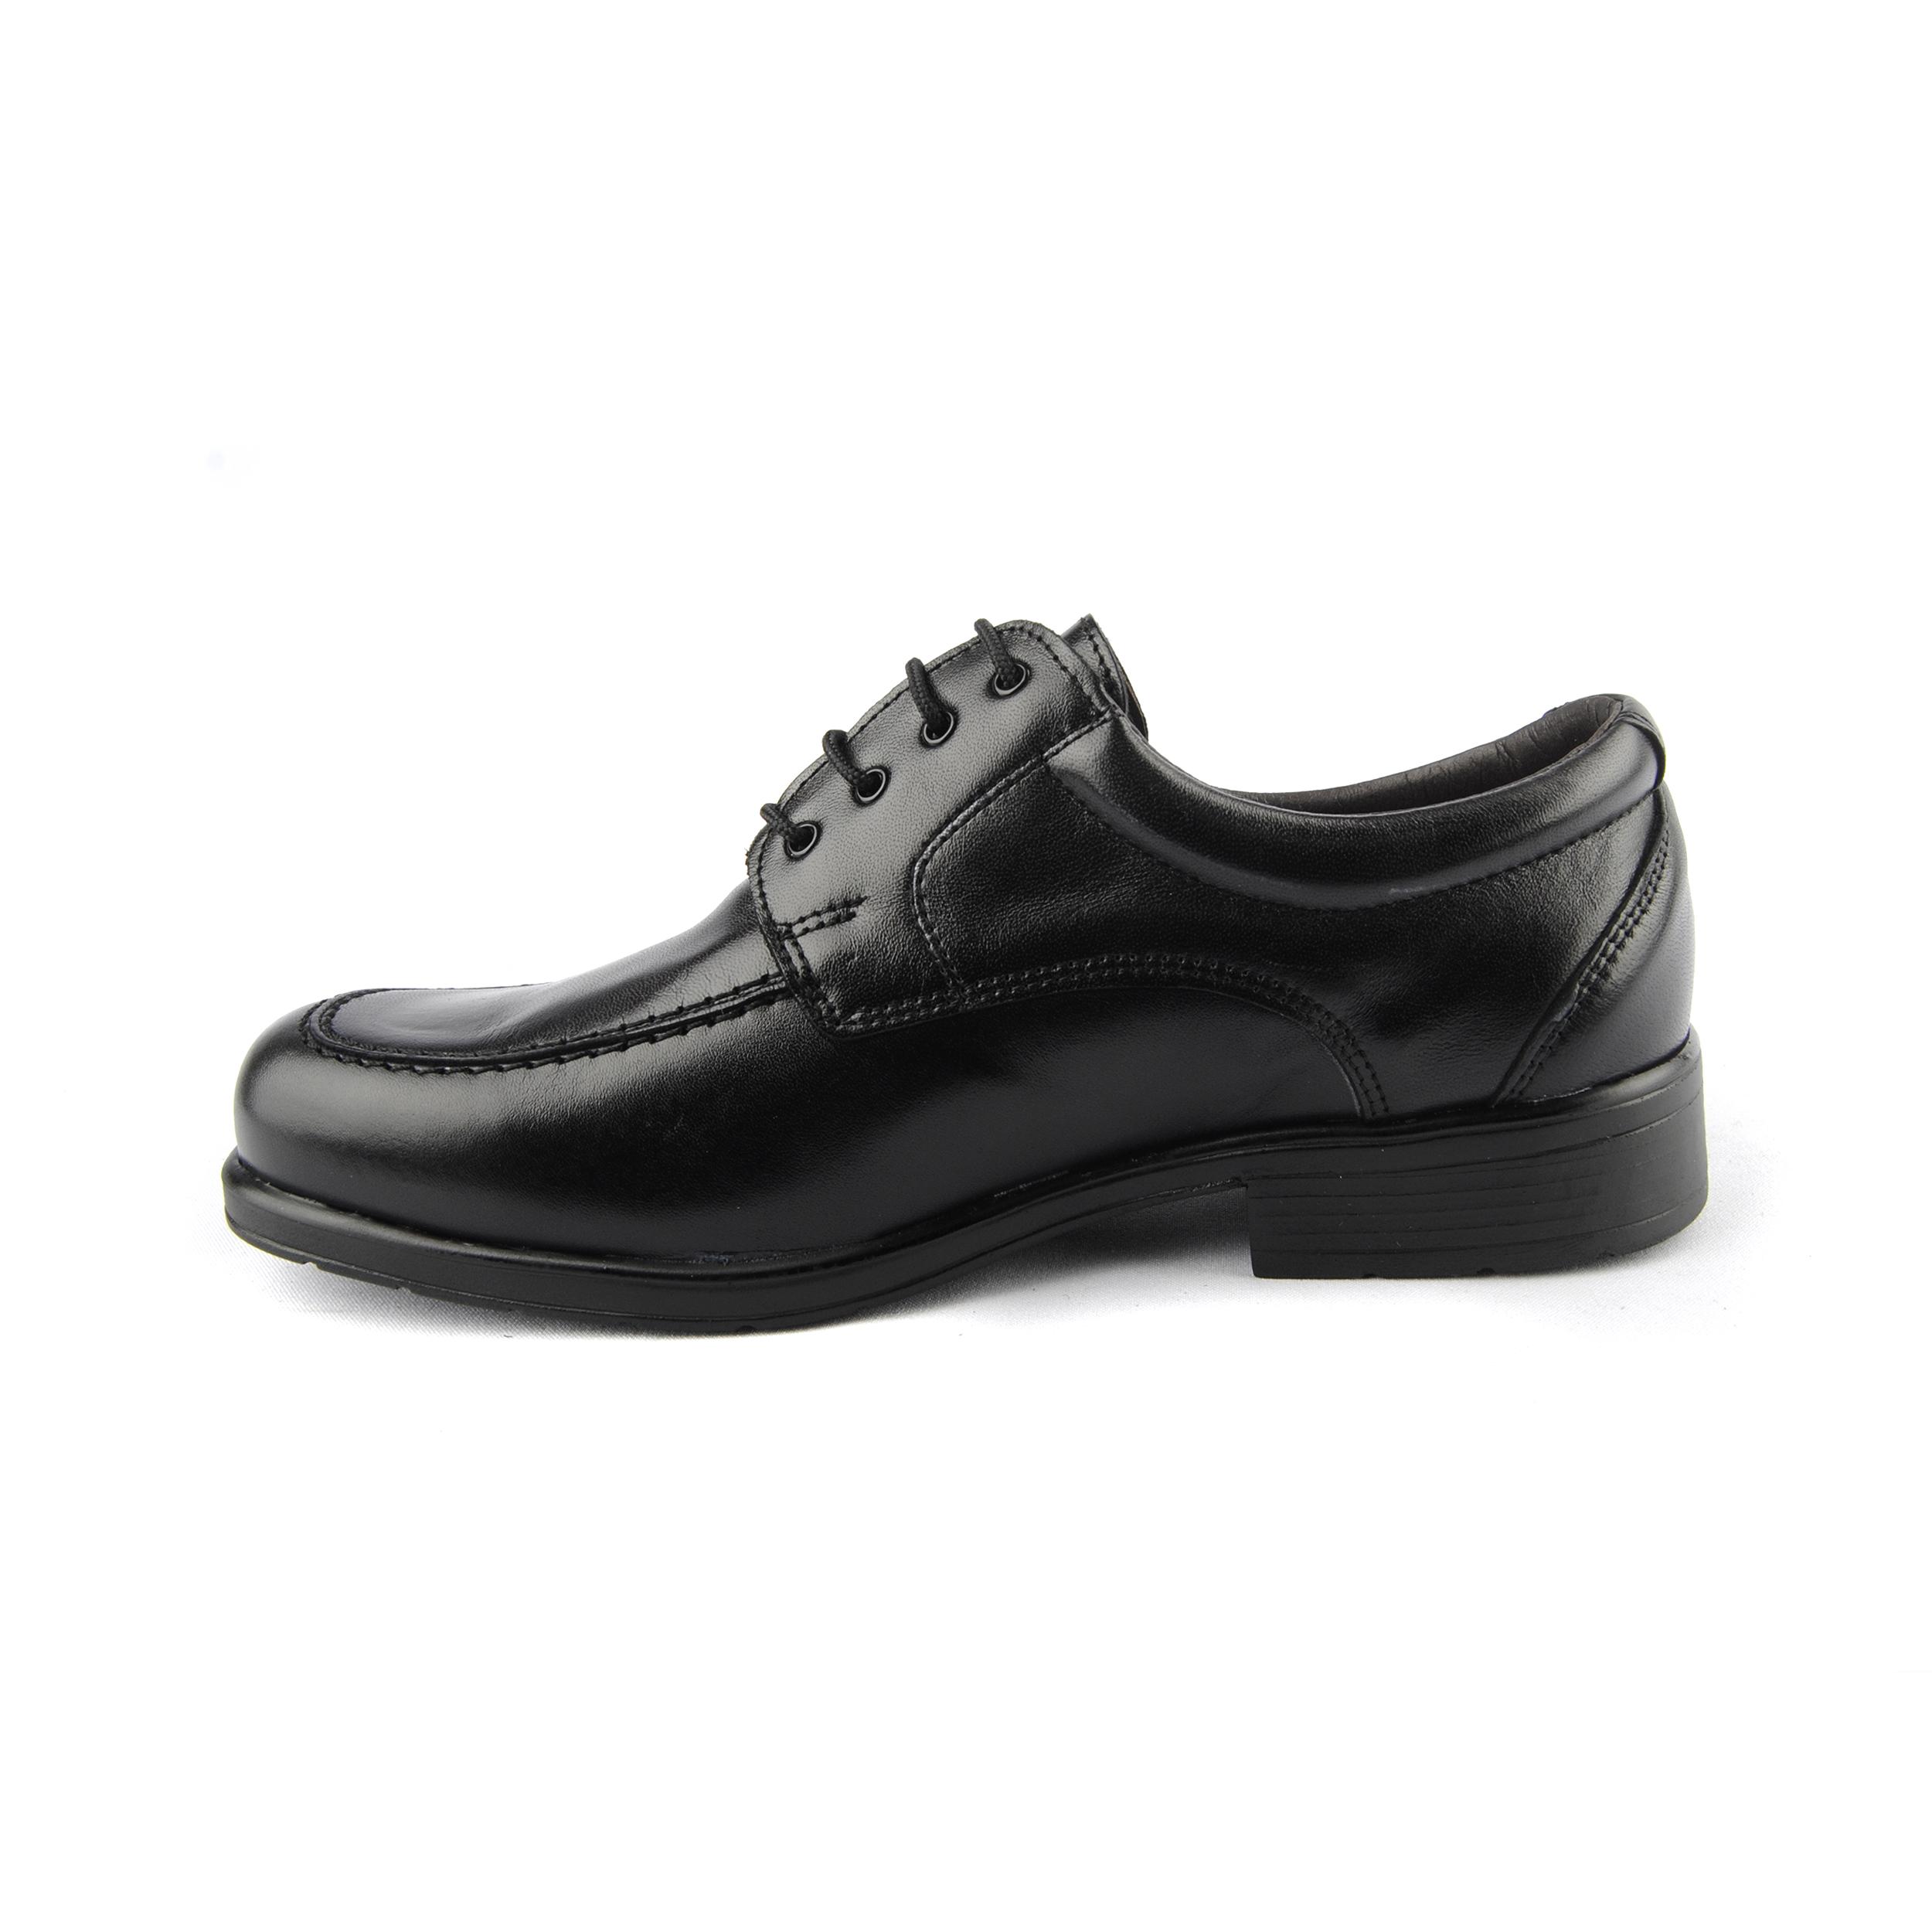 Soloalto Hombre Especial Precio Soloalto Zapatos Zapatos qqwT4za